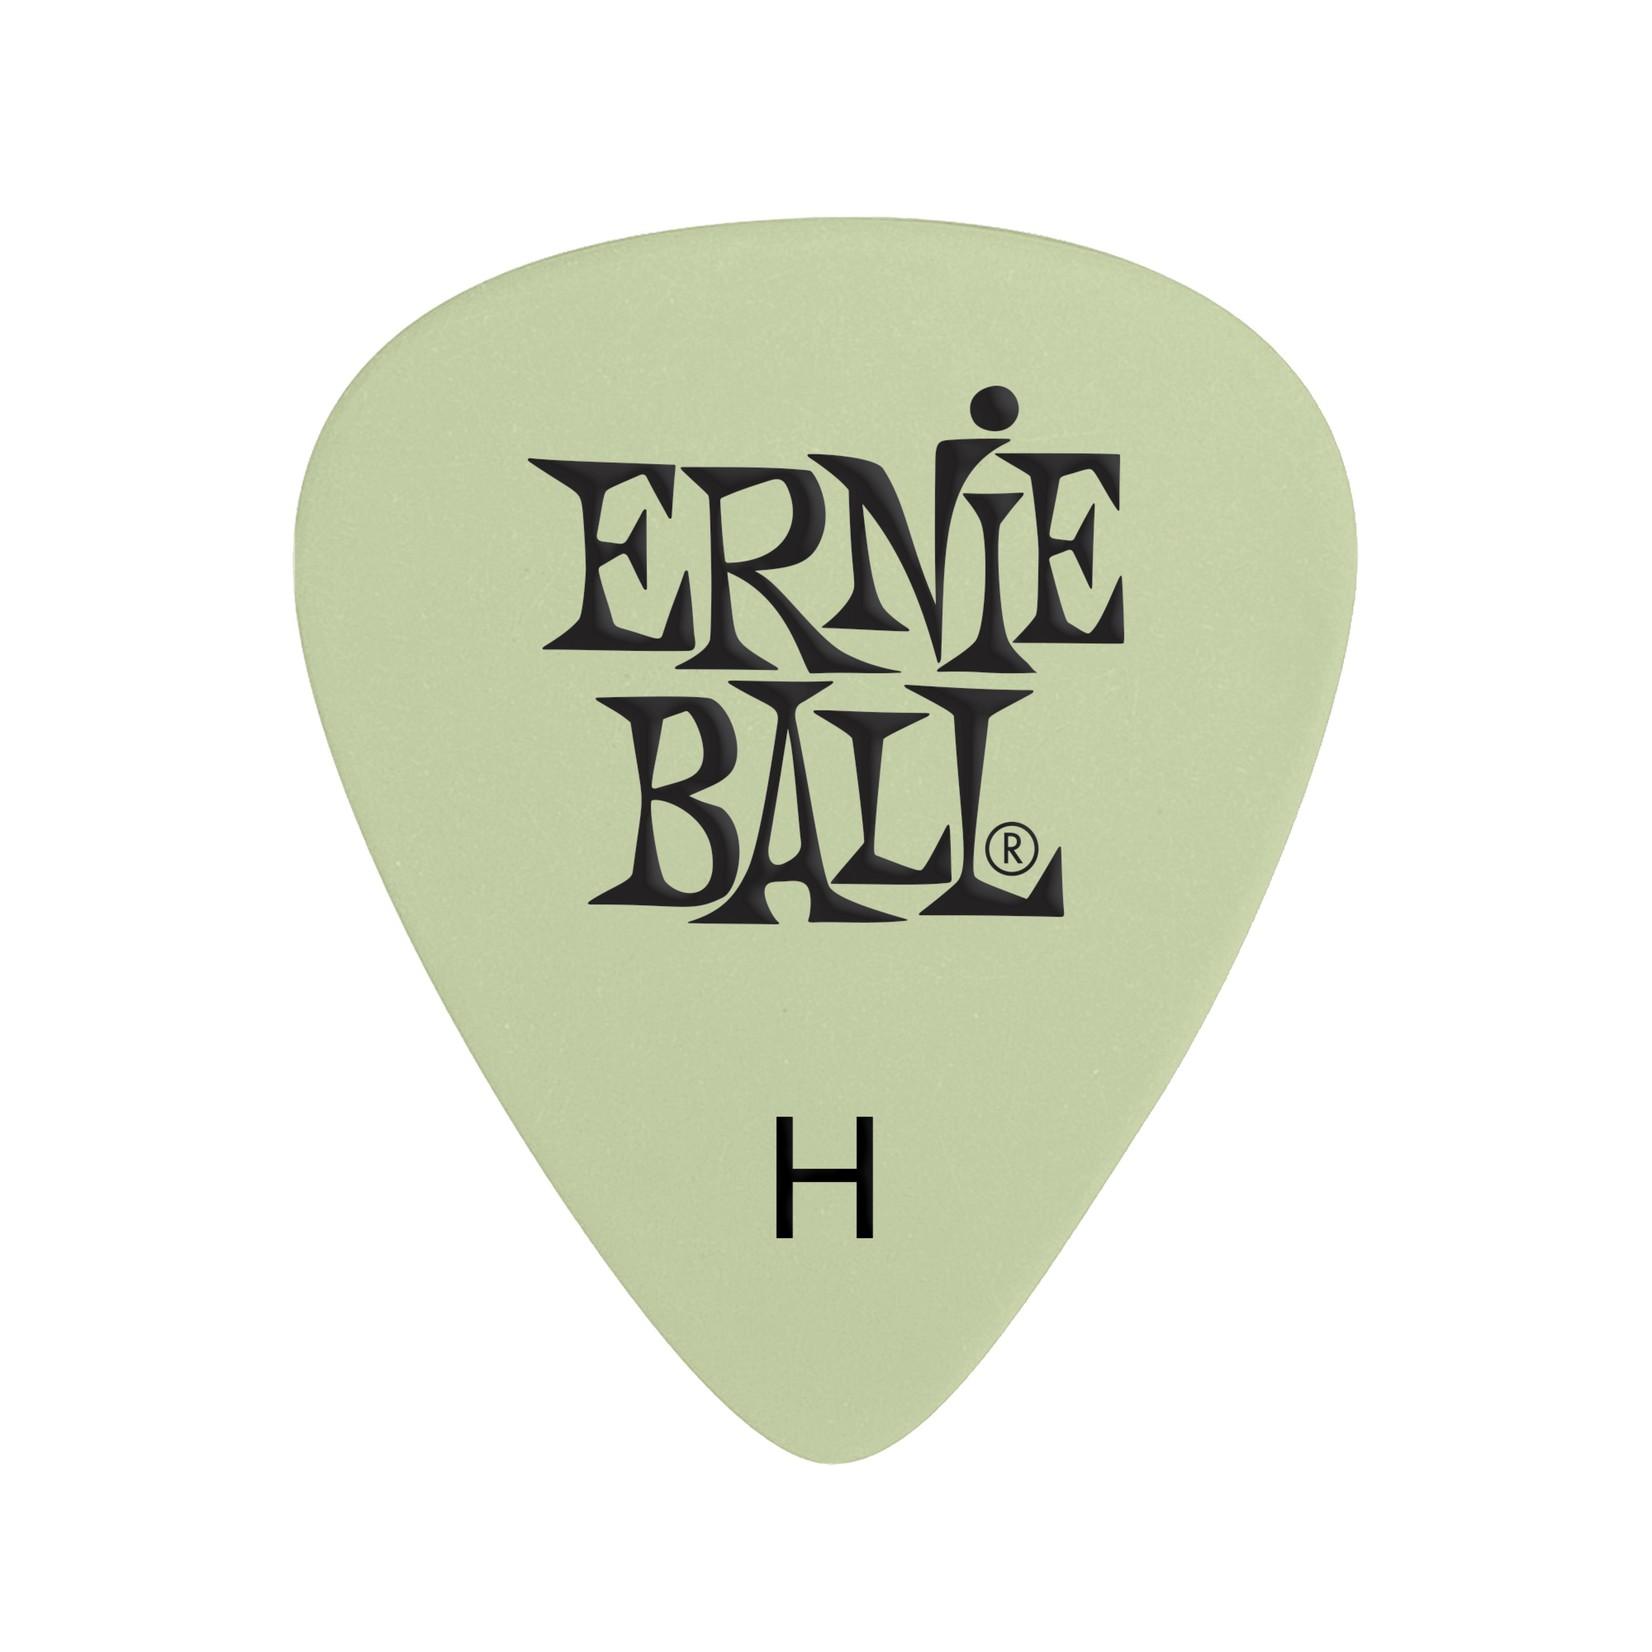 Ernie Ball Ernie Ball Super Glow Cellulose Picks Heavy 12-pack